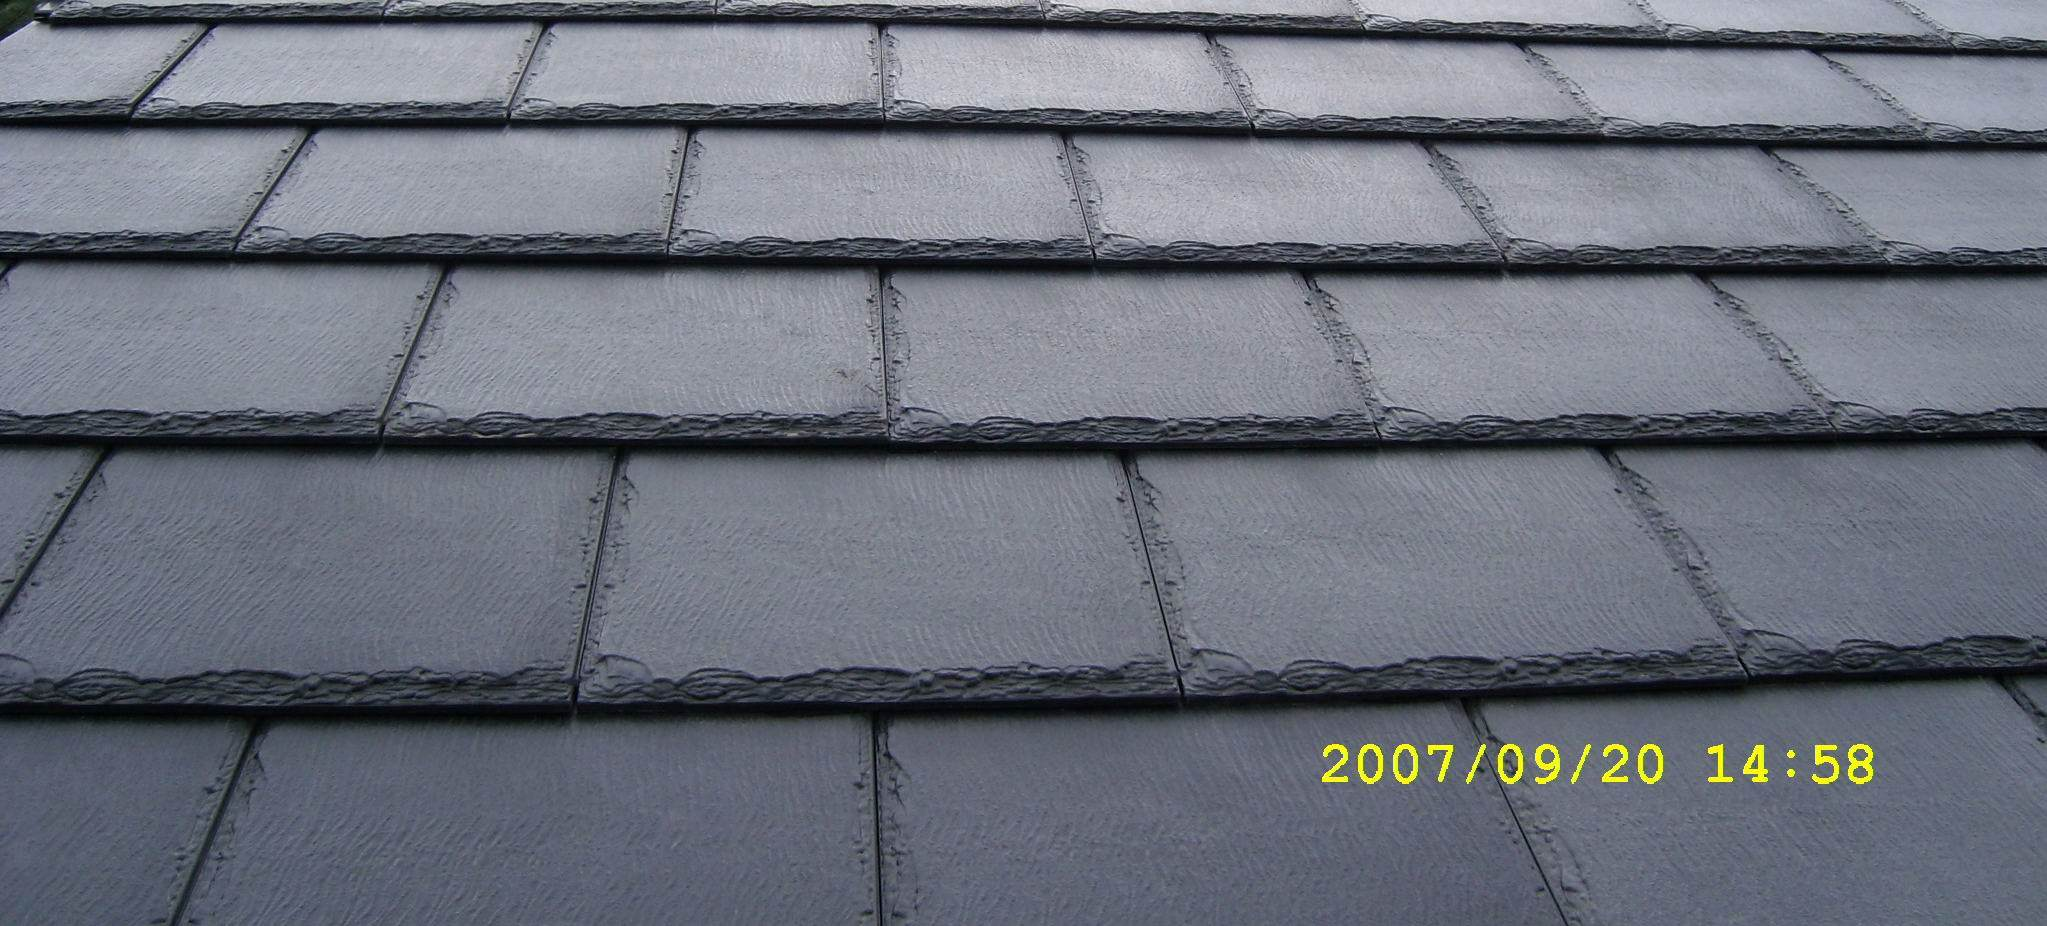 Tile Roof: Slate Tile Roof